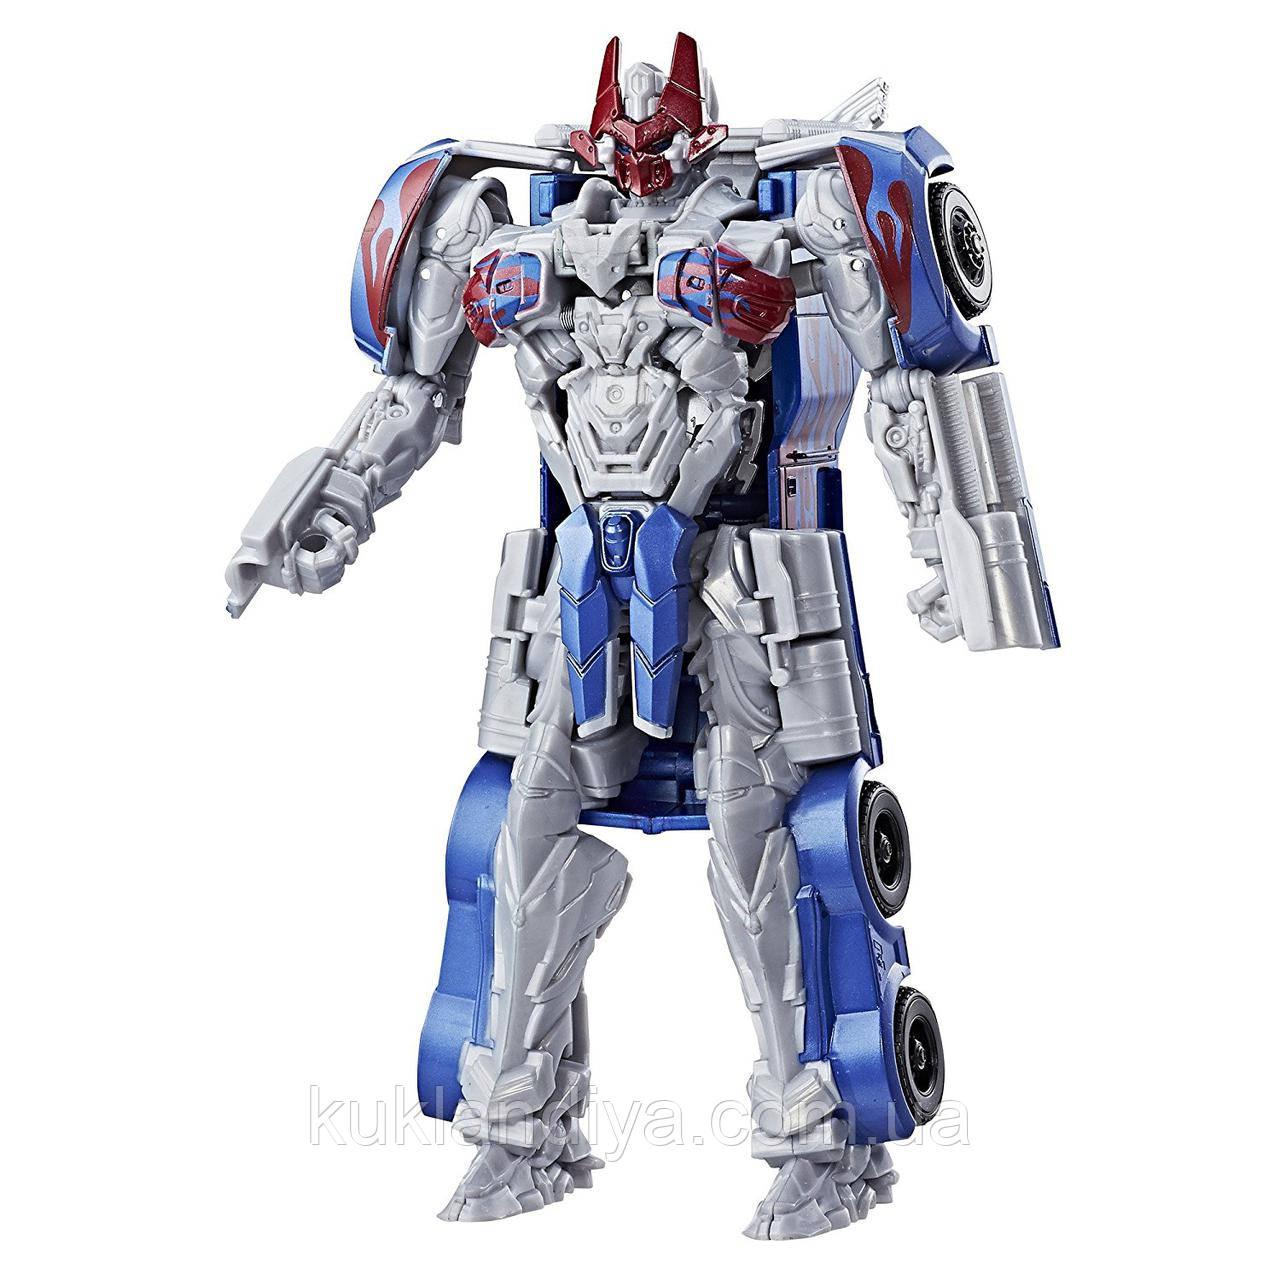 Transformers: Последний Рыцарь Оптимус Прайм